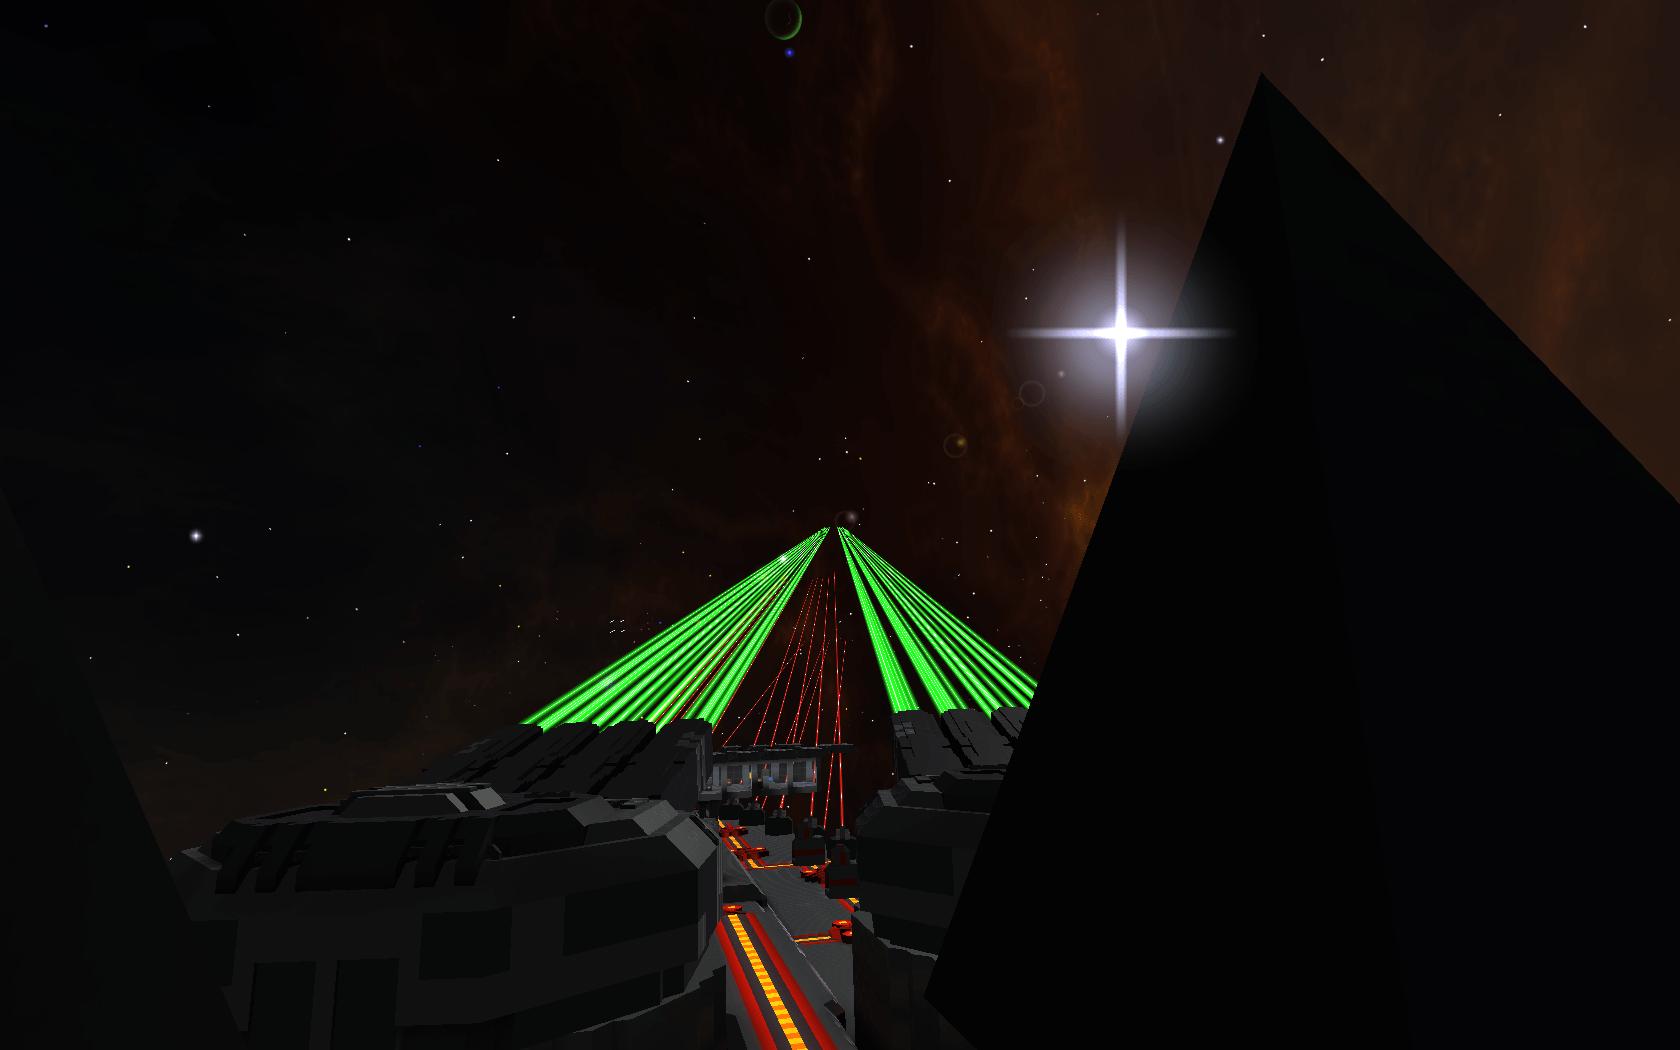 starmade-screenshot-0496-Oldknight-Mk (2).png